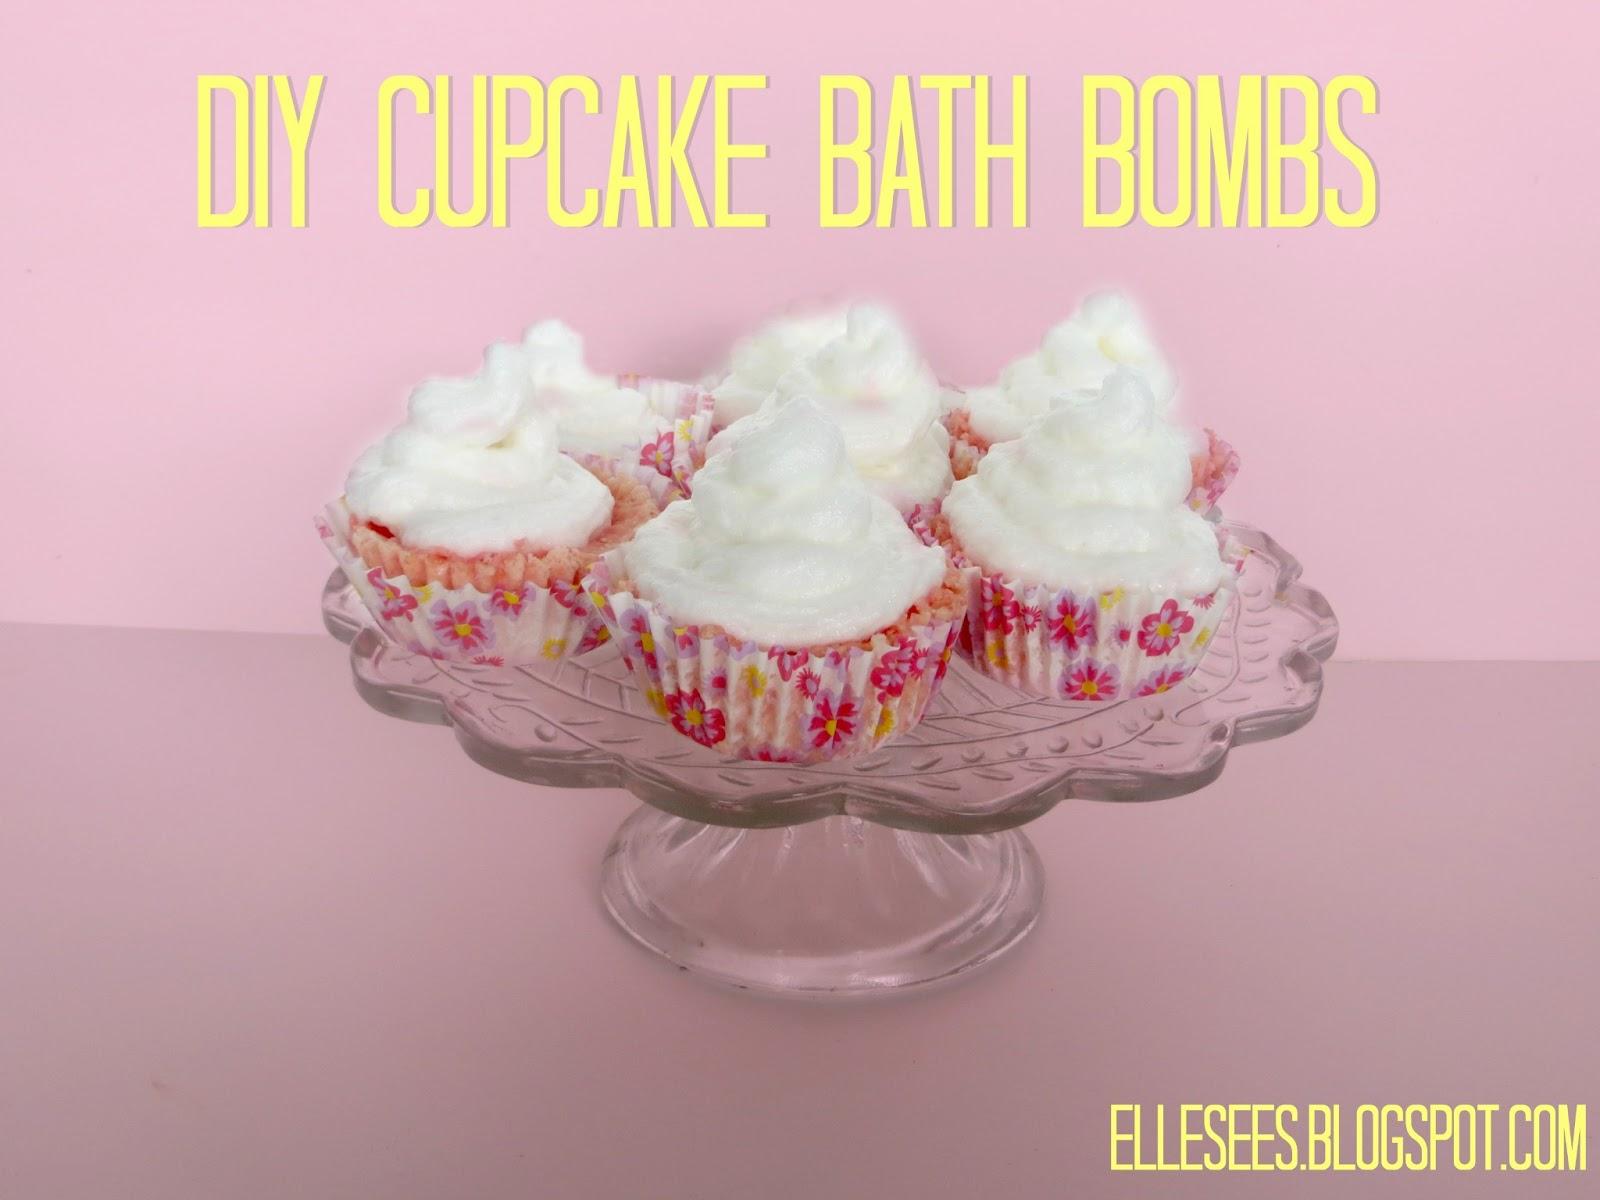 Elle Sees|| Beauty Blogger in Atlanta: DIY: Cupake Bath Bombs